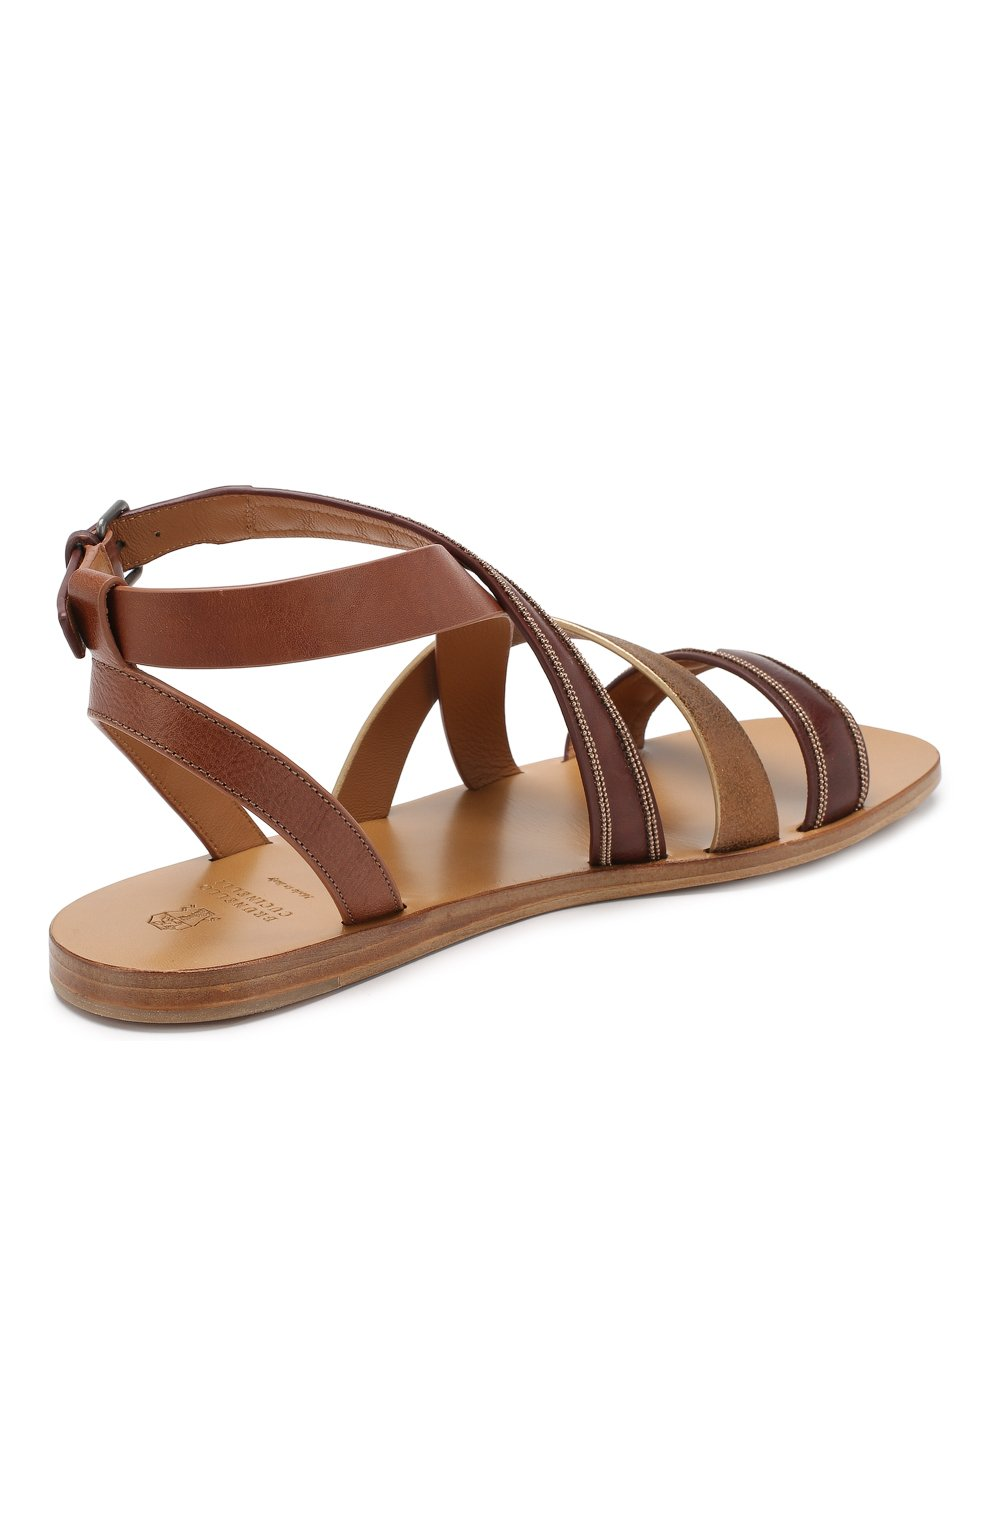 Кожаные сандалии Brunello Cucinelli коричневые | Фото №4